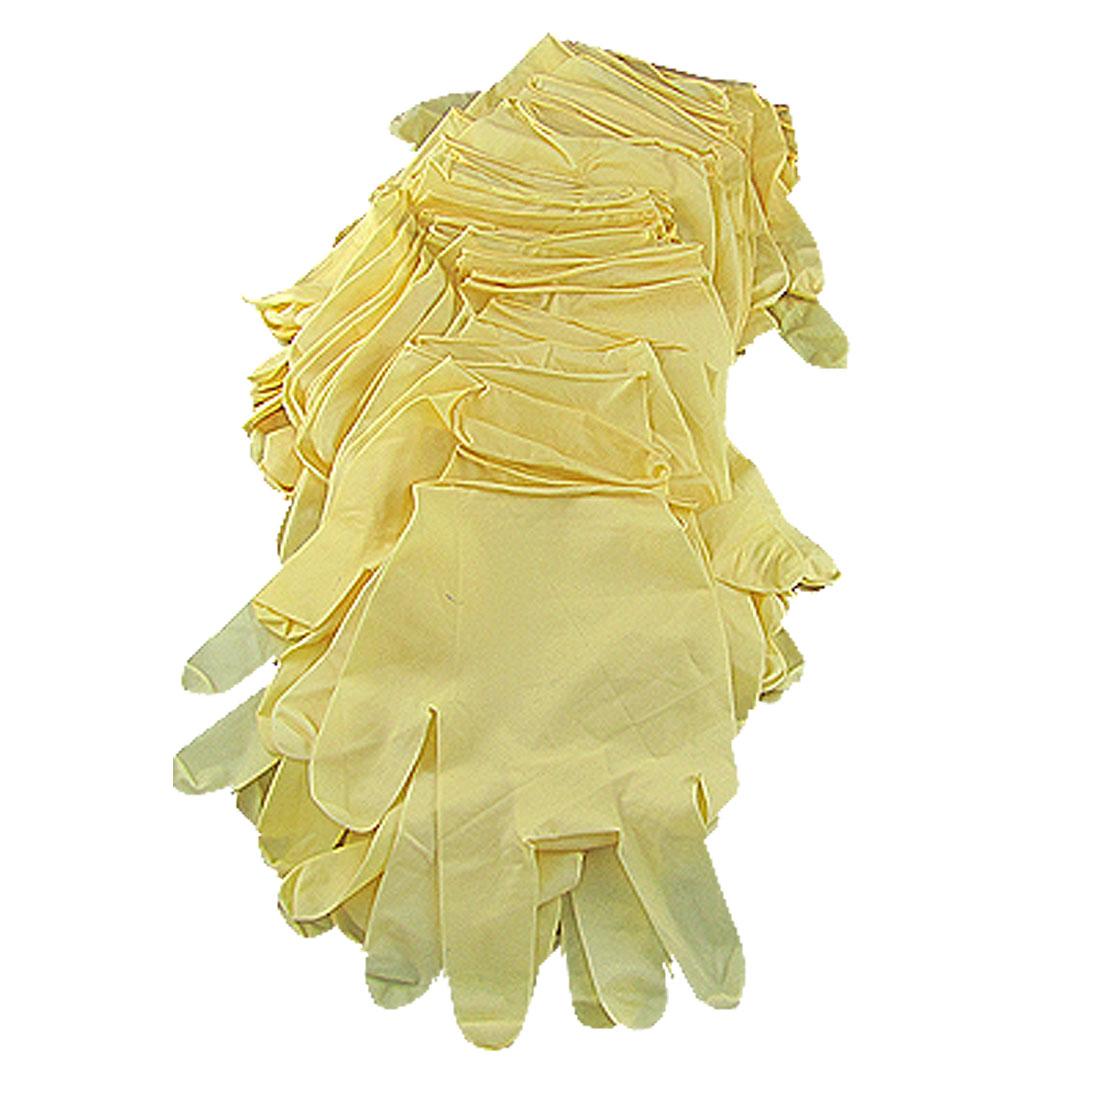 60 Pieces Smooth Disposable Latex Examination Exam Gloves